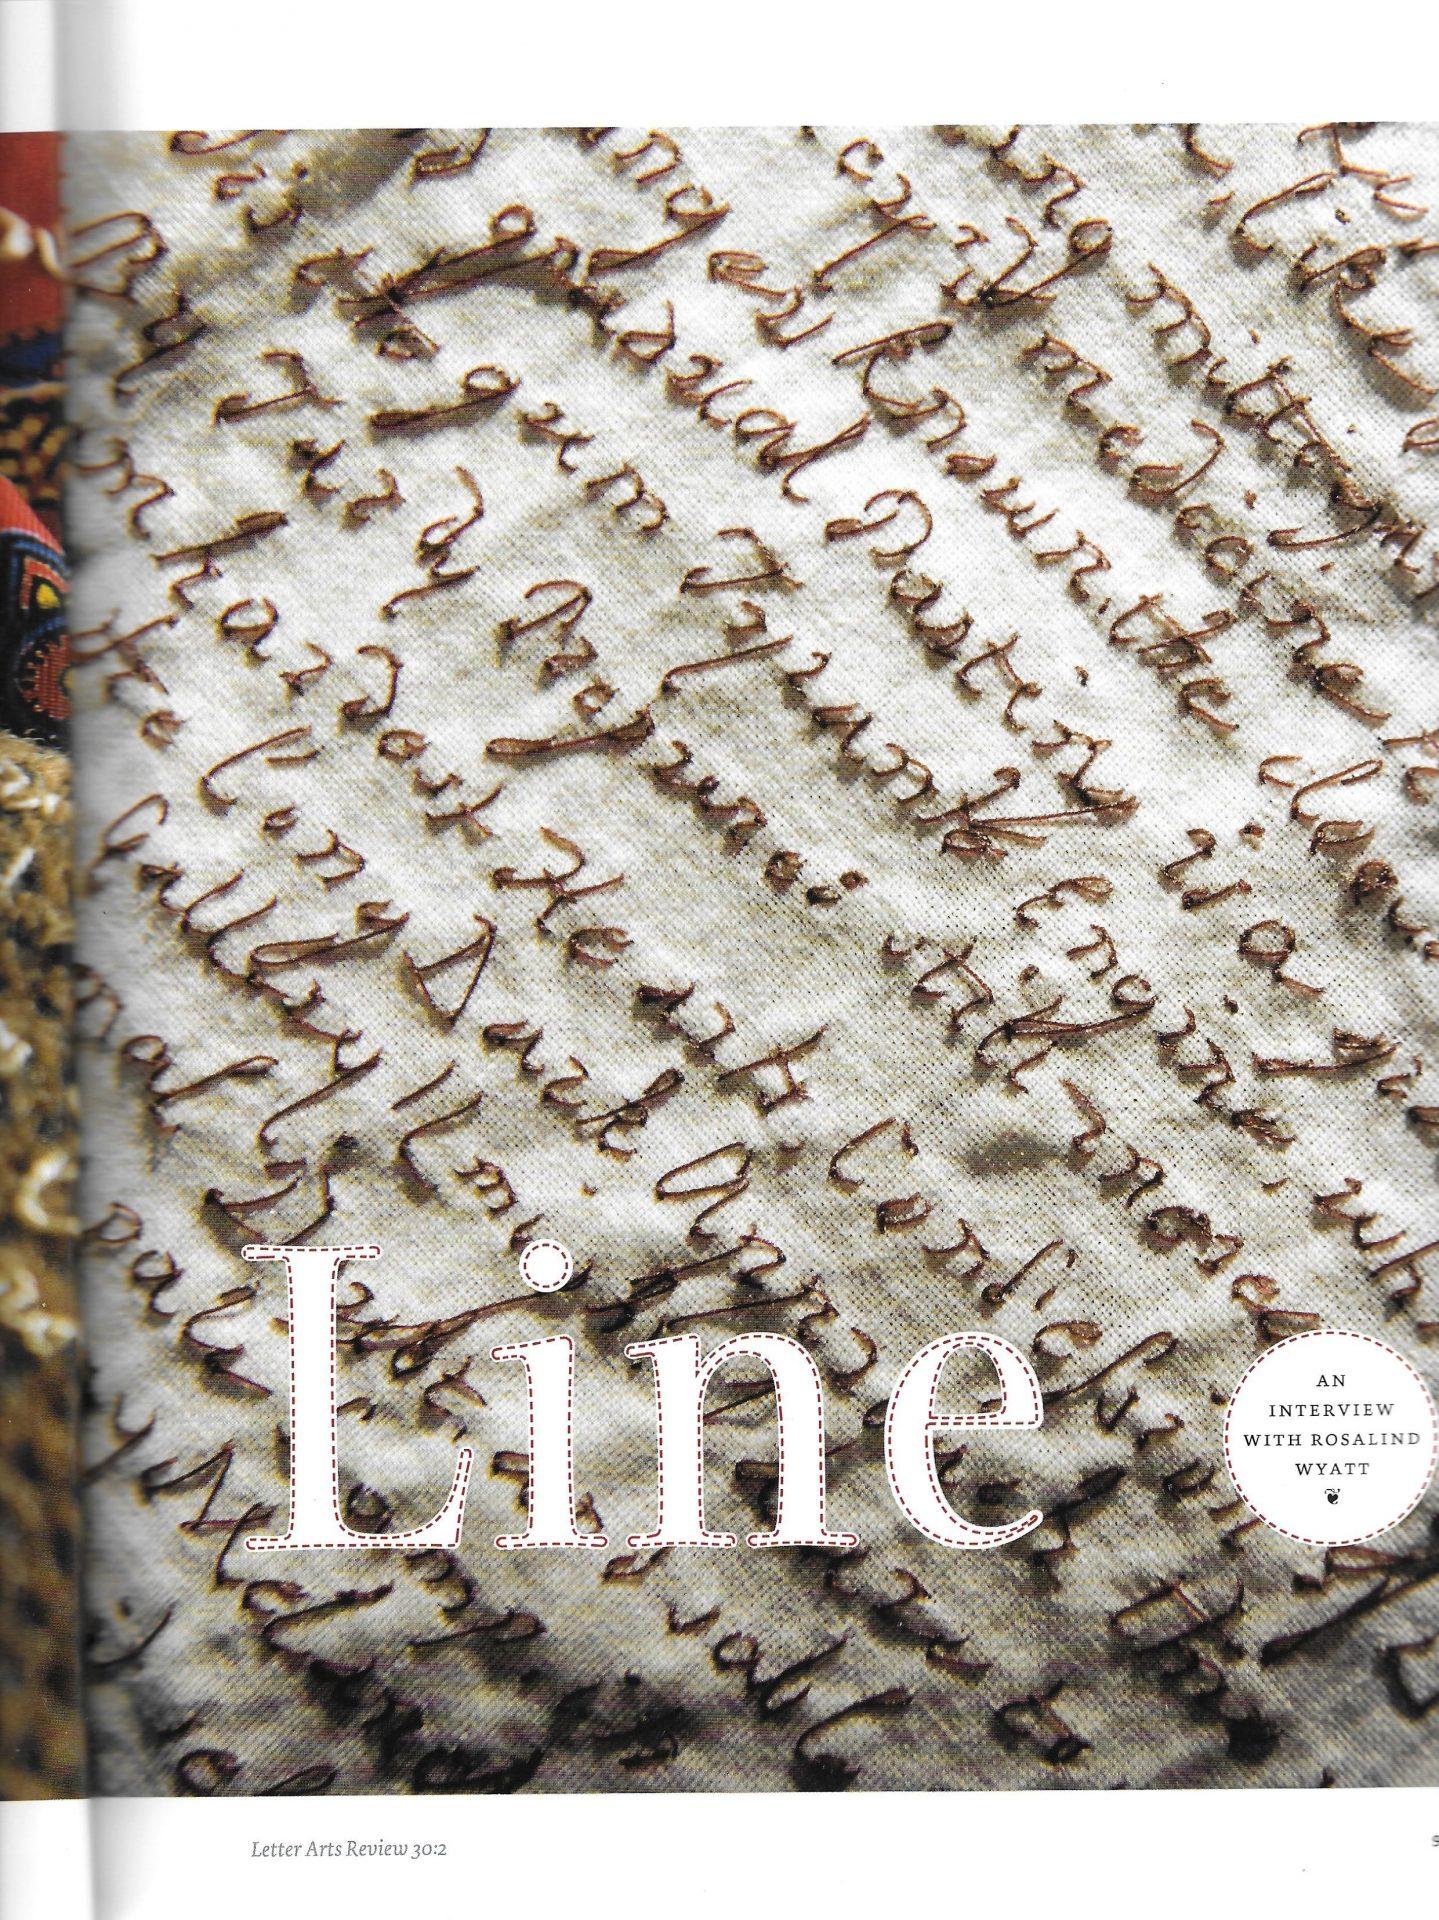 Letter Arts Review Article 2016